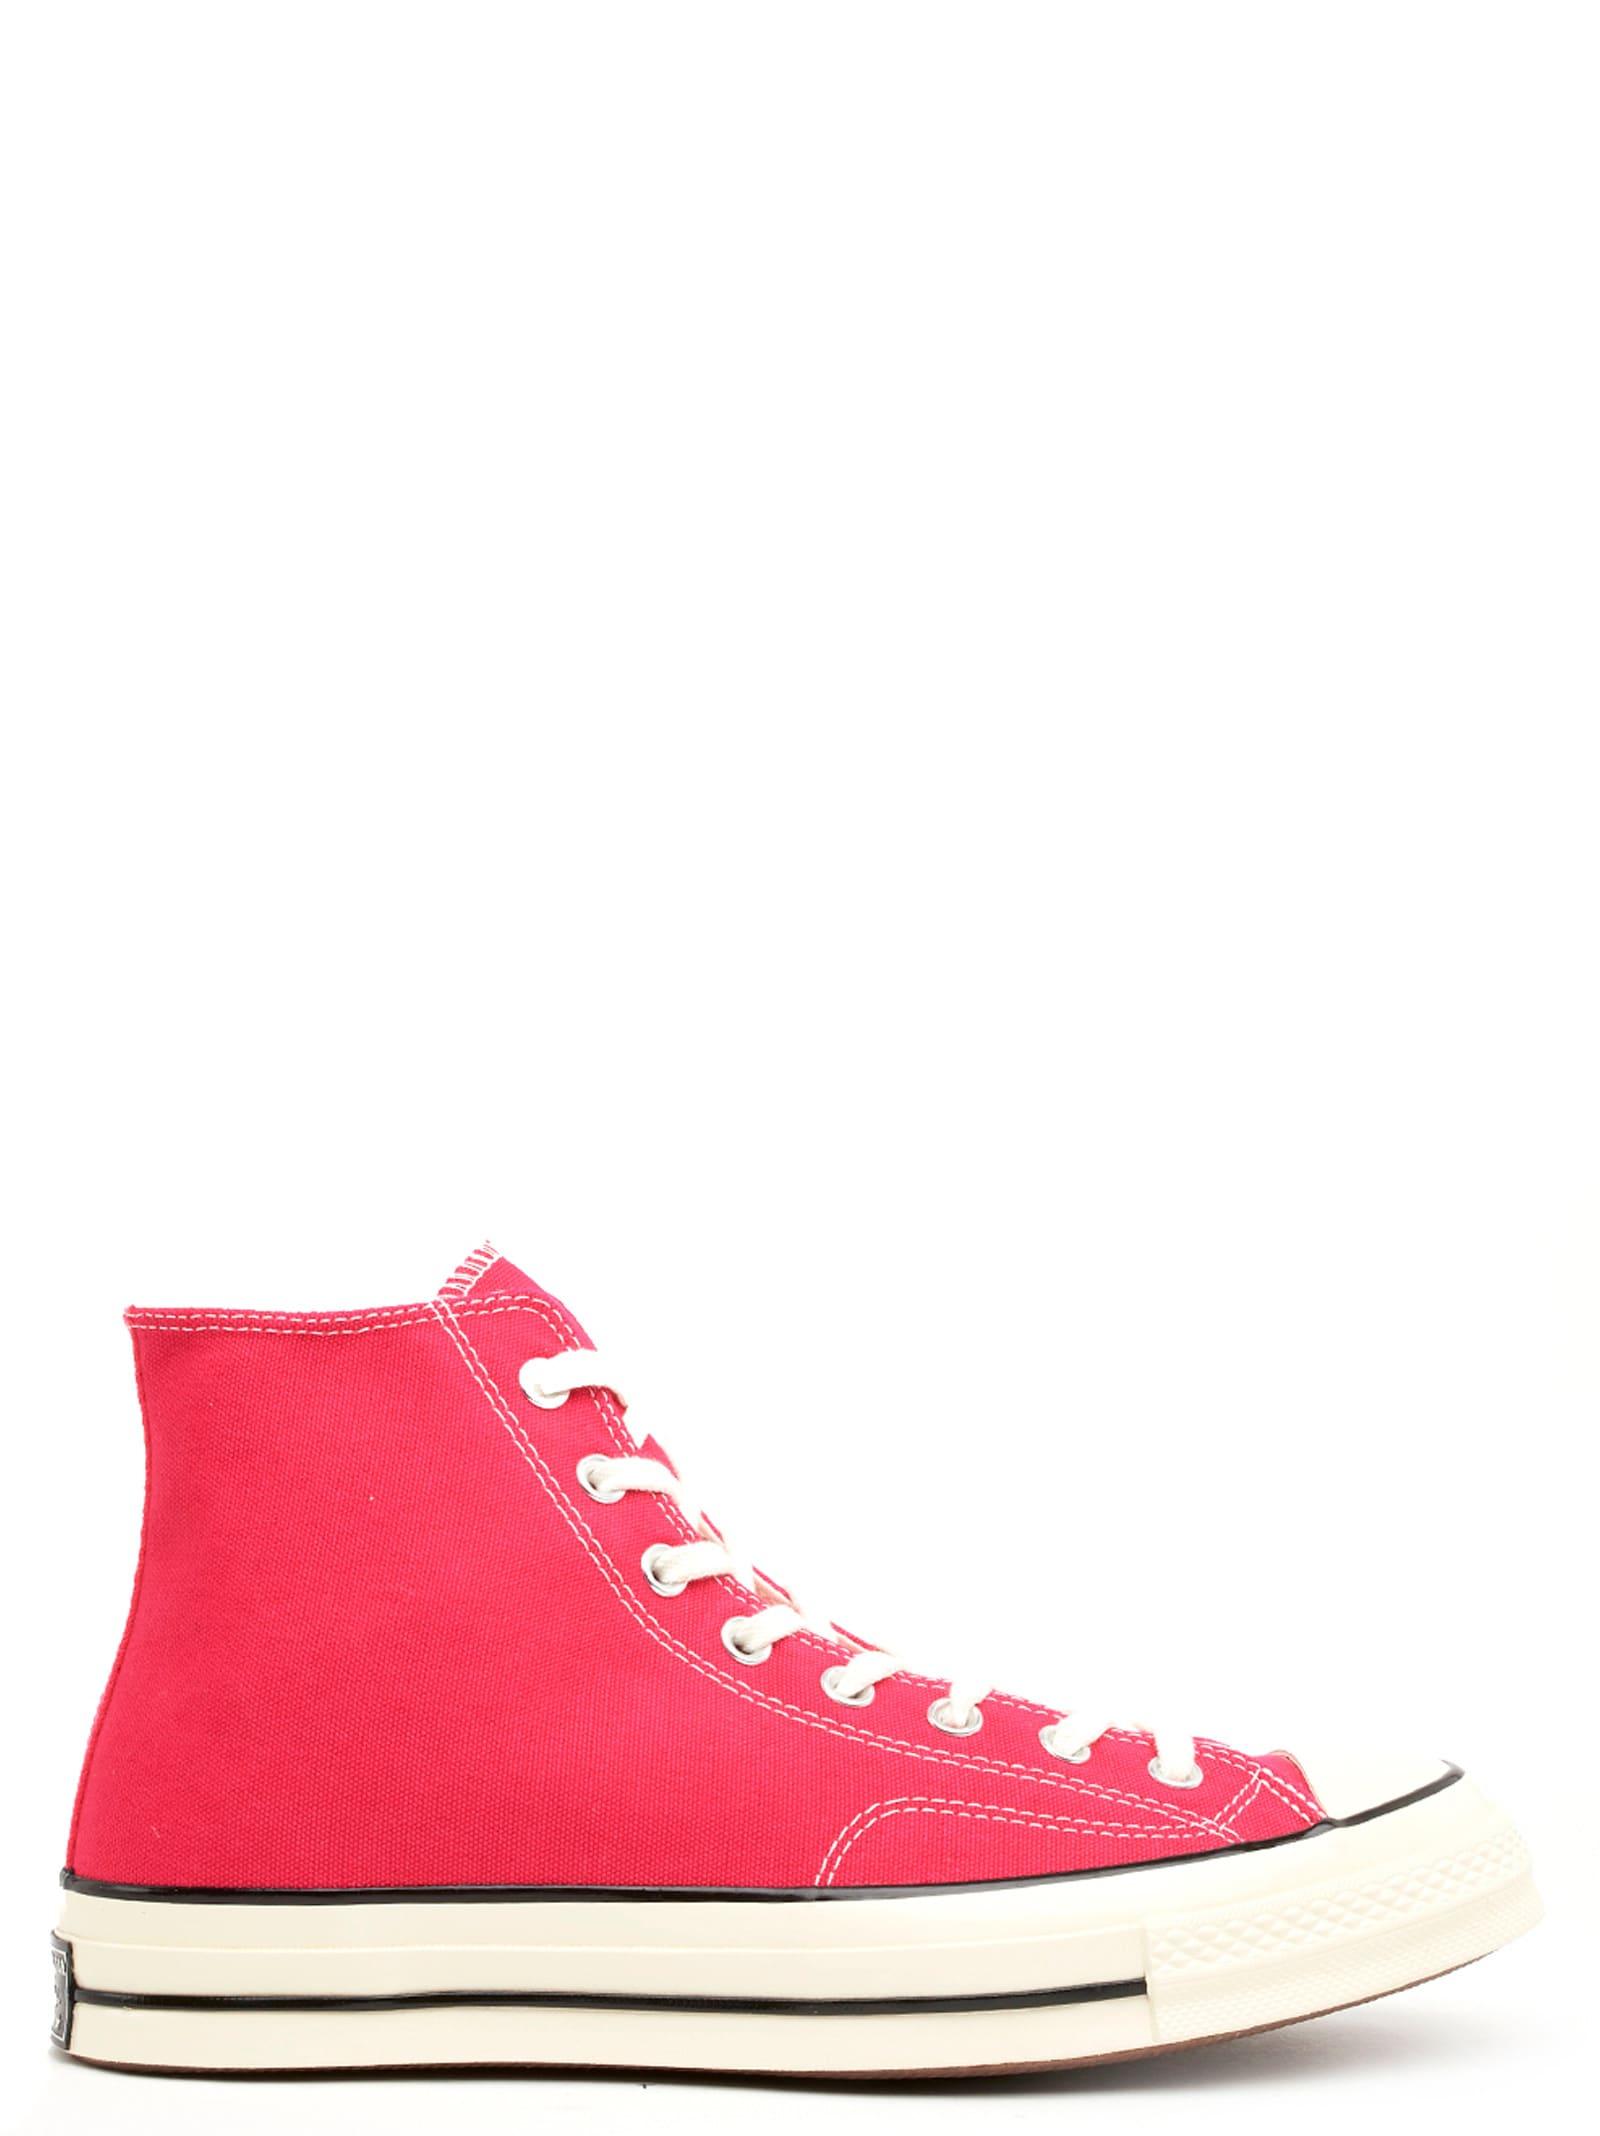 Converse chuck Taylor 1970s Shoes